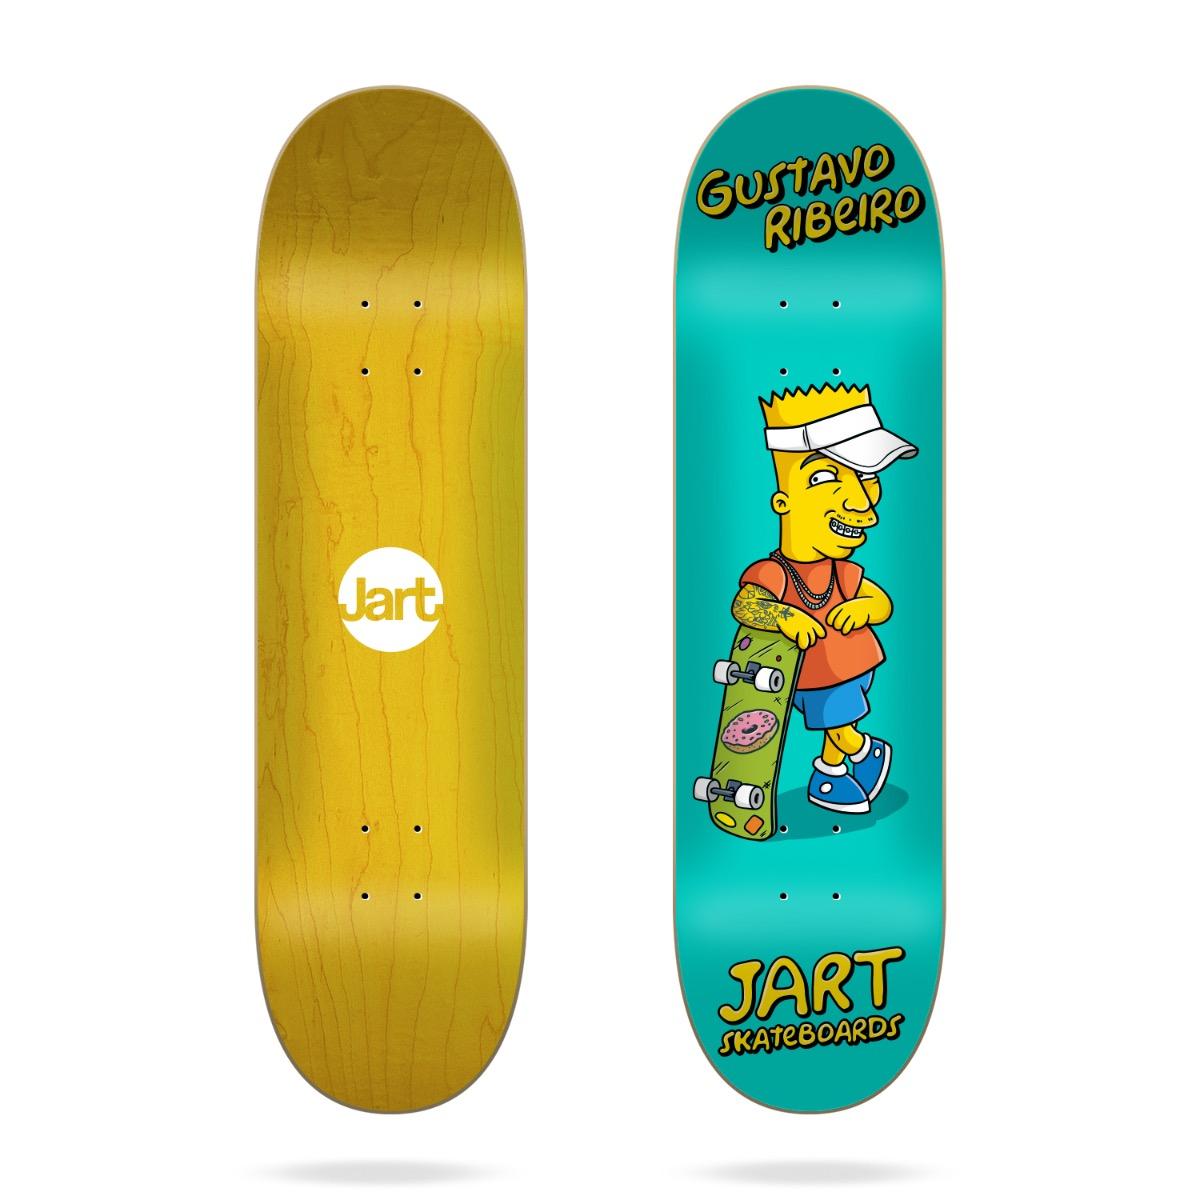 "Tavola Skateboard Jart CutOff 8.0"" LC Gustavo Ribeiro"